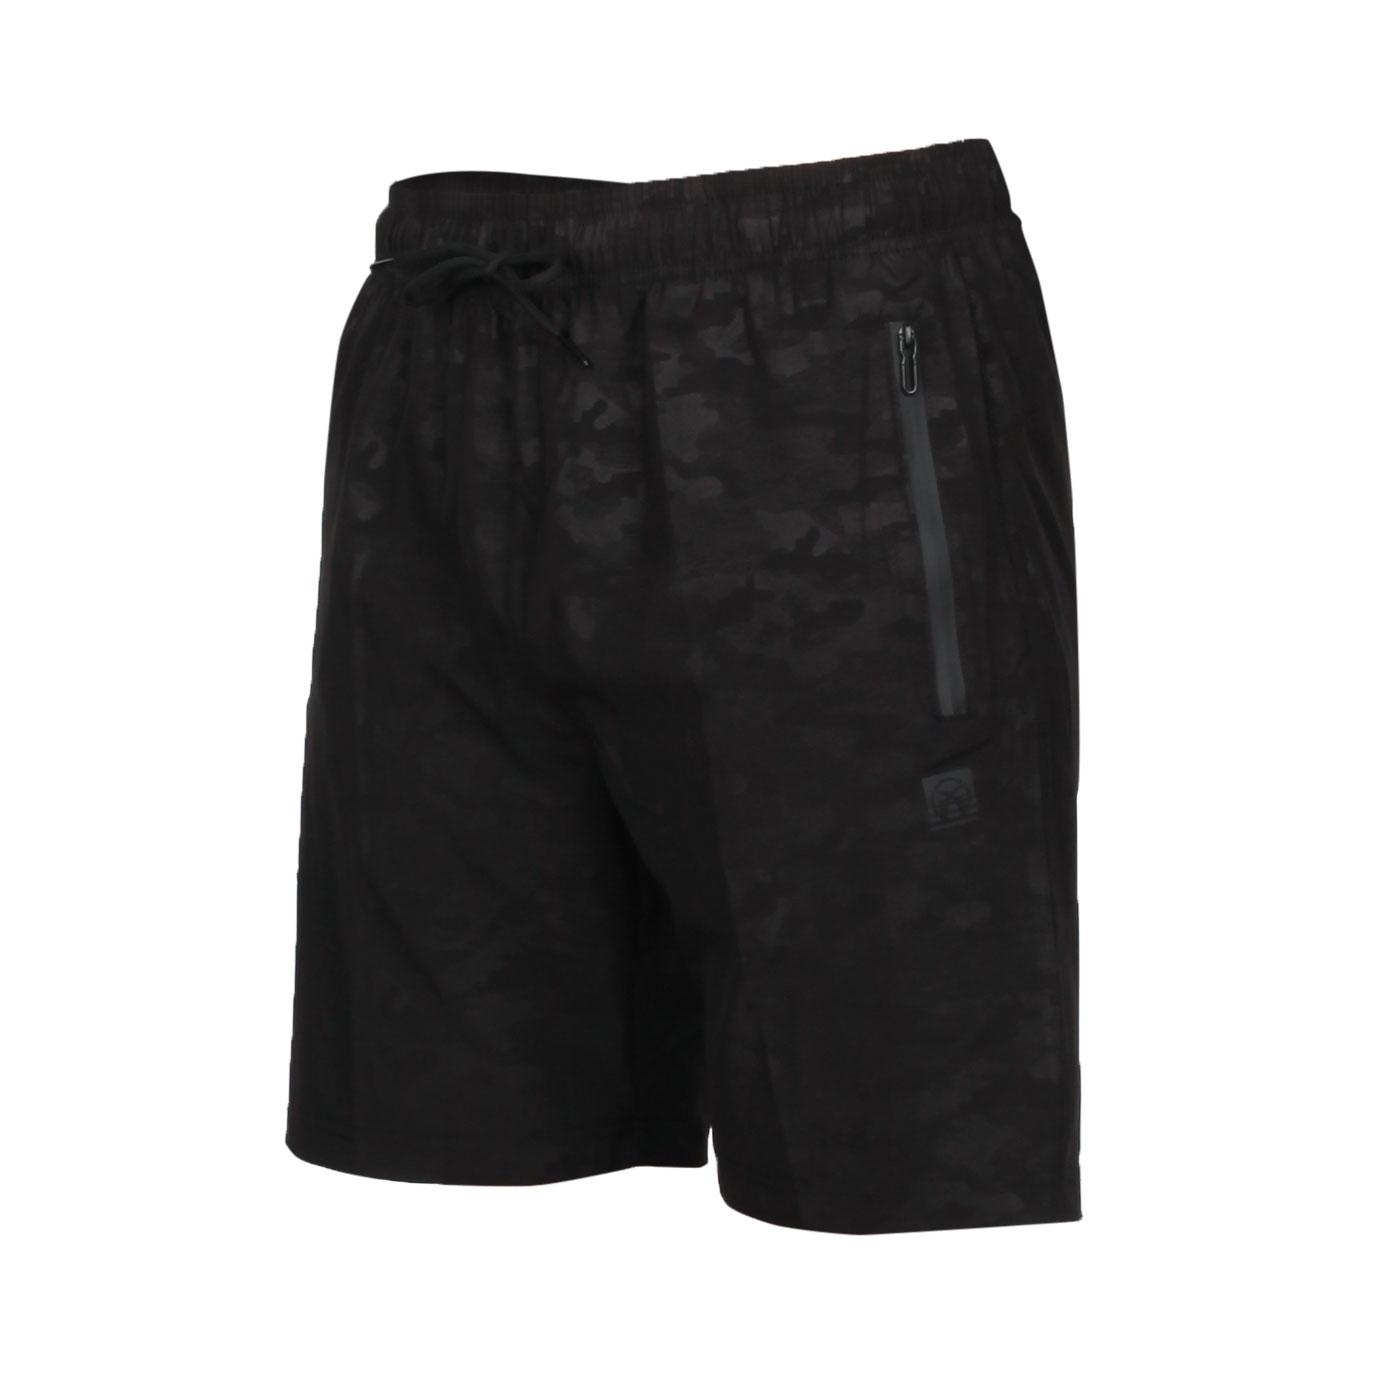 FIRESTAR 男款彈性平織短褲 C0518-10 - 迷彩黑